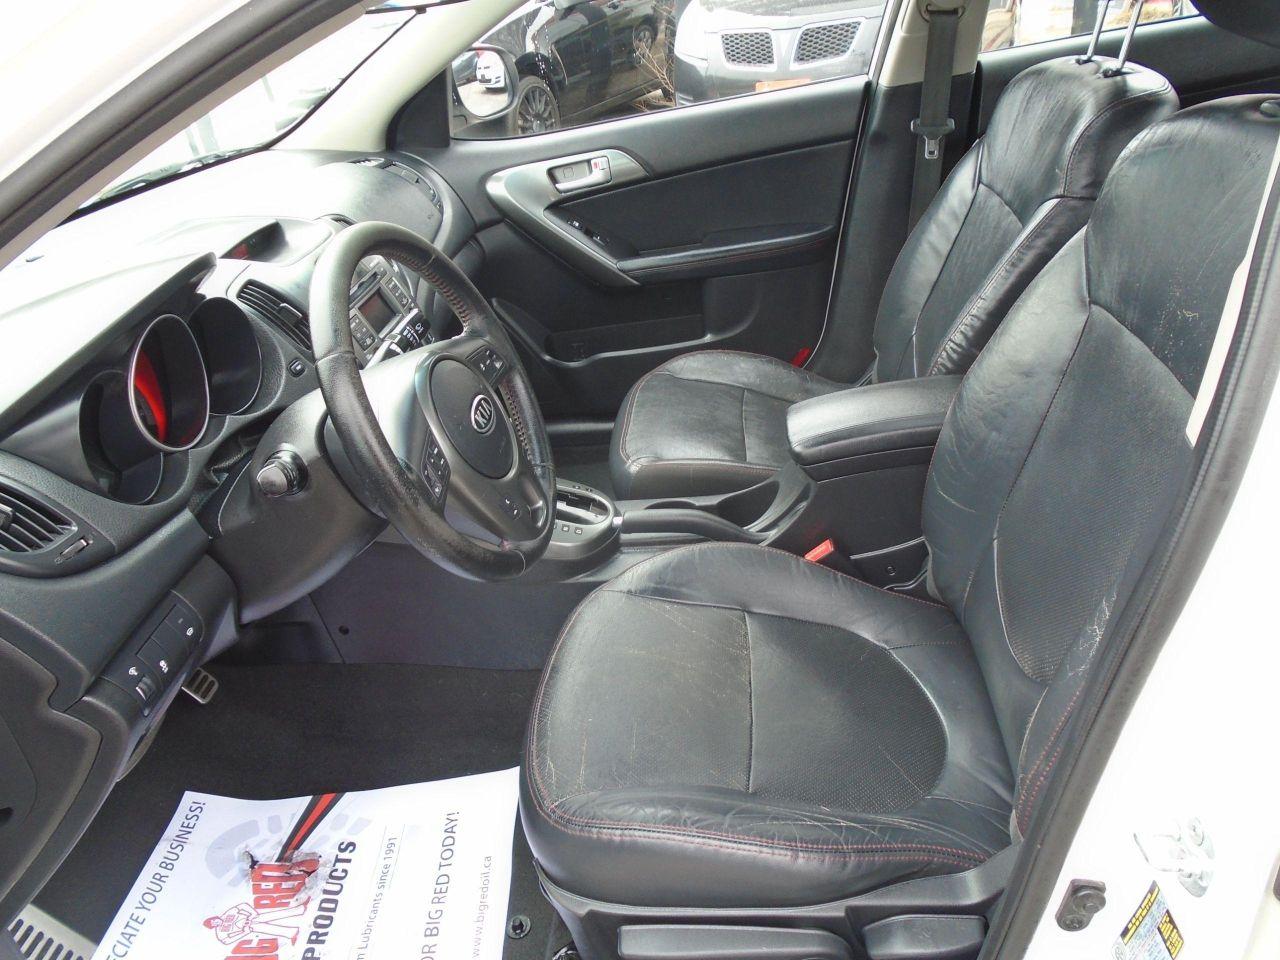 2010 Kia Forte